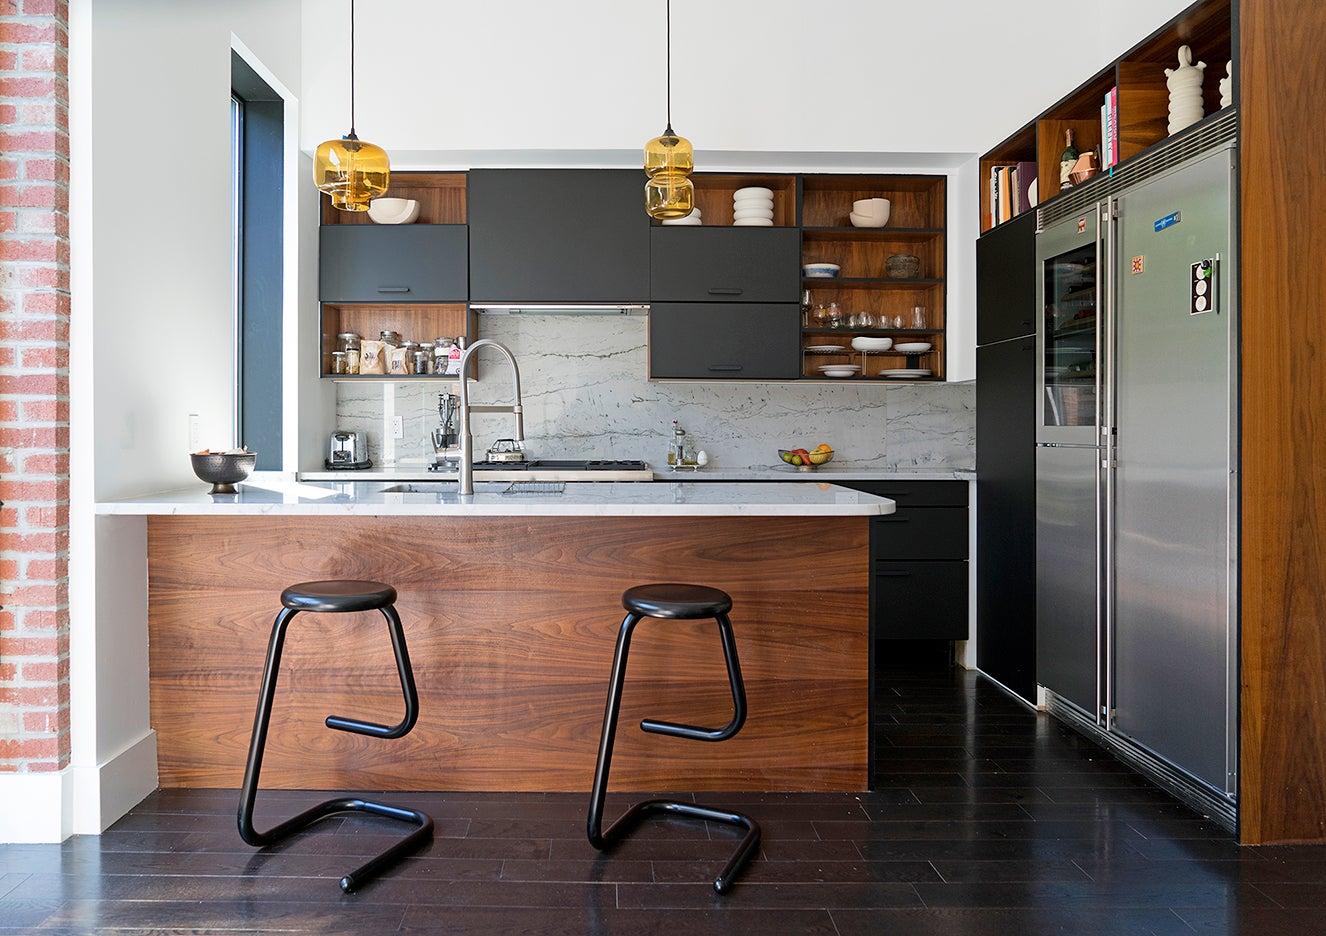 Walnut and black kitchen